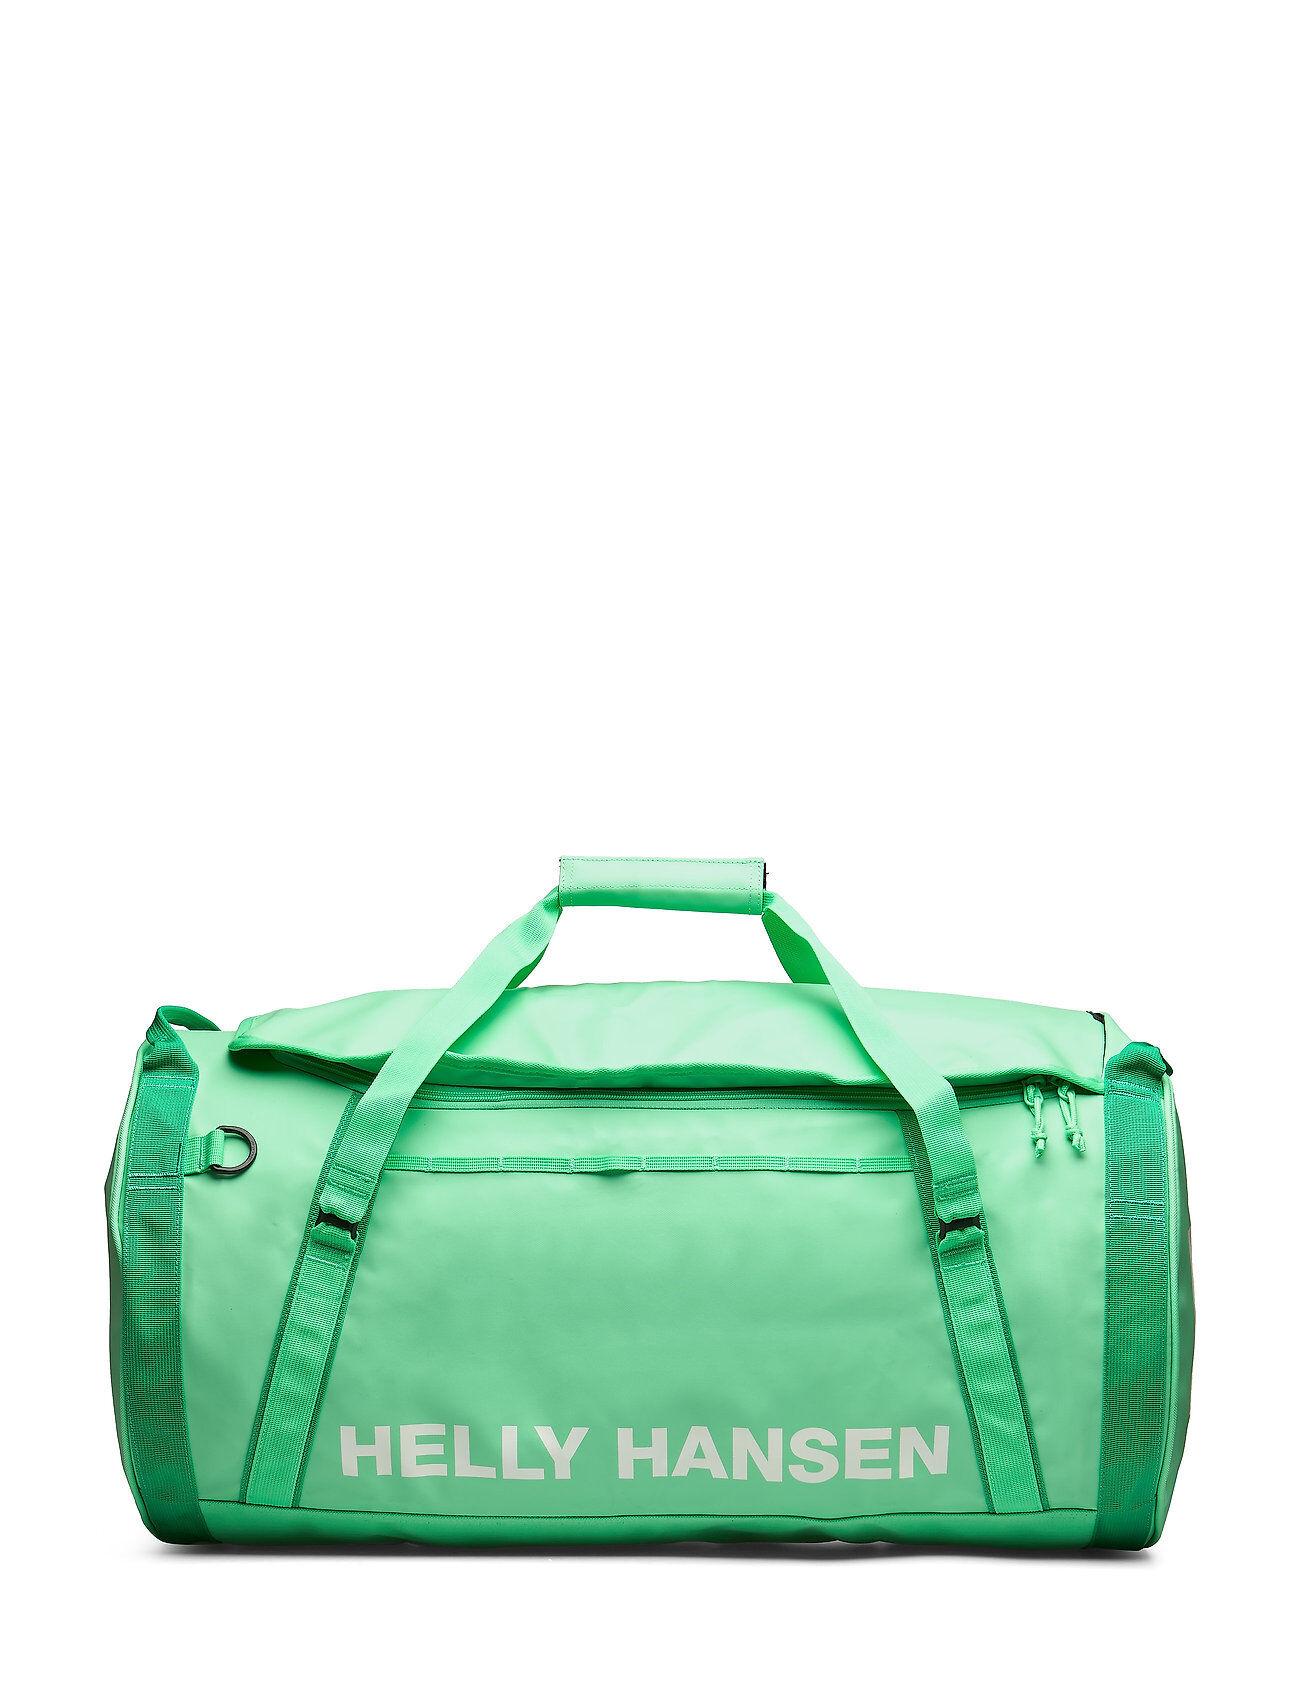 Image of Helly Hansen Hh Duffel Bag 2 70l Bags Weekend & Gym Bags Vihreä Helly Hansen